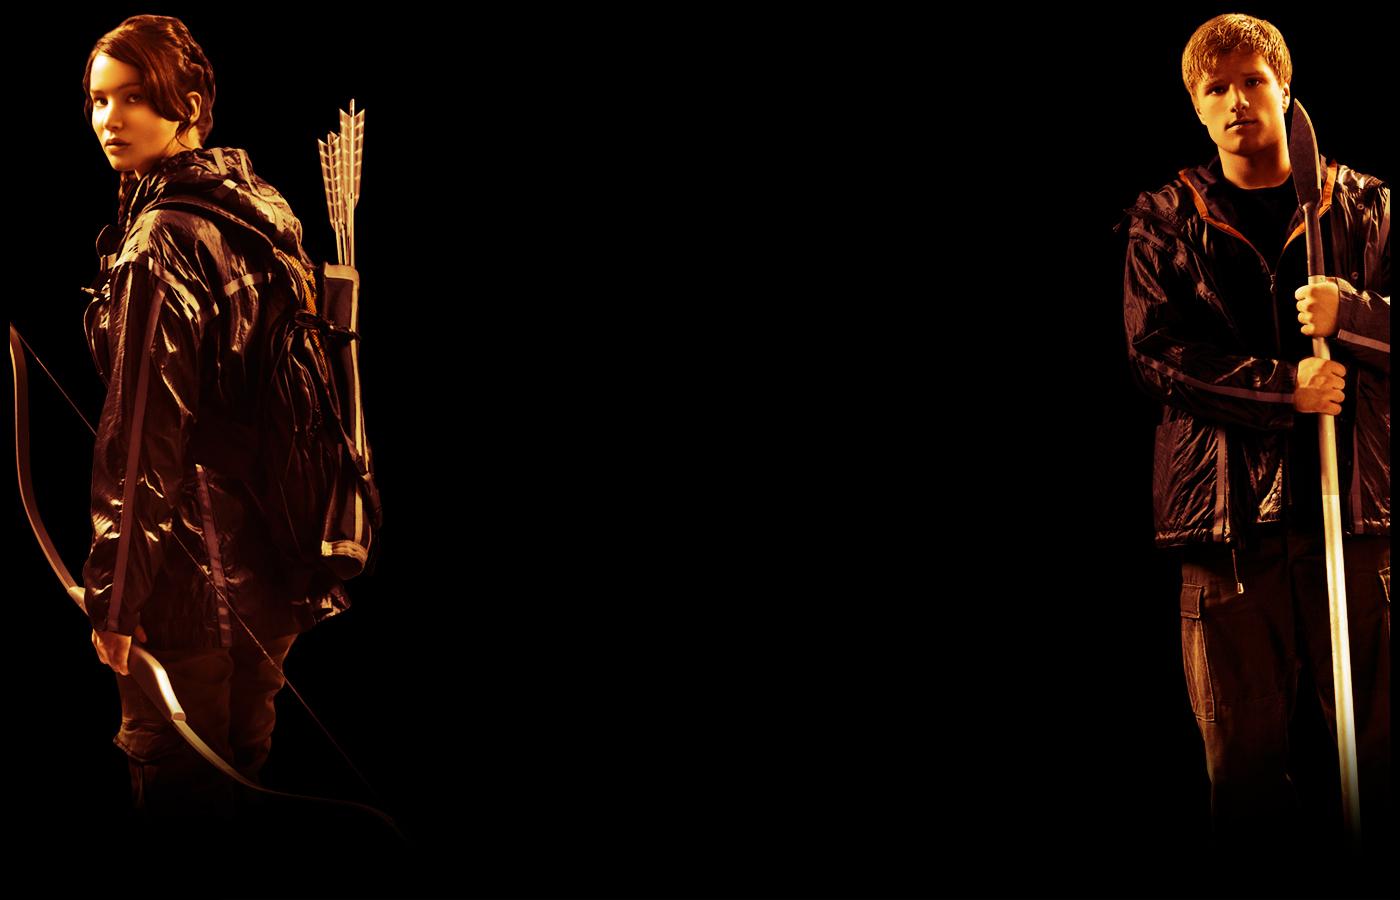 Katniss and Peeta Wallpaper   Peeta Mellark and Katniss Everdeen 1400x900